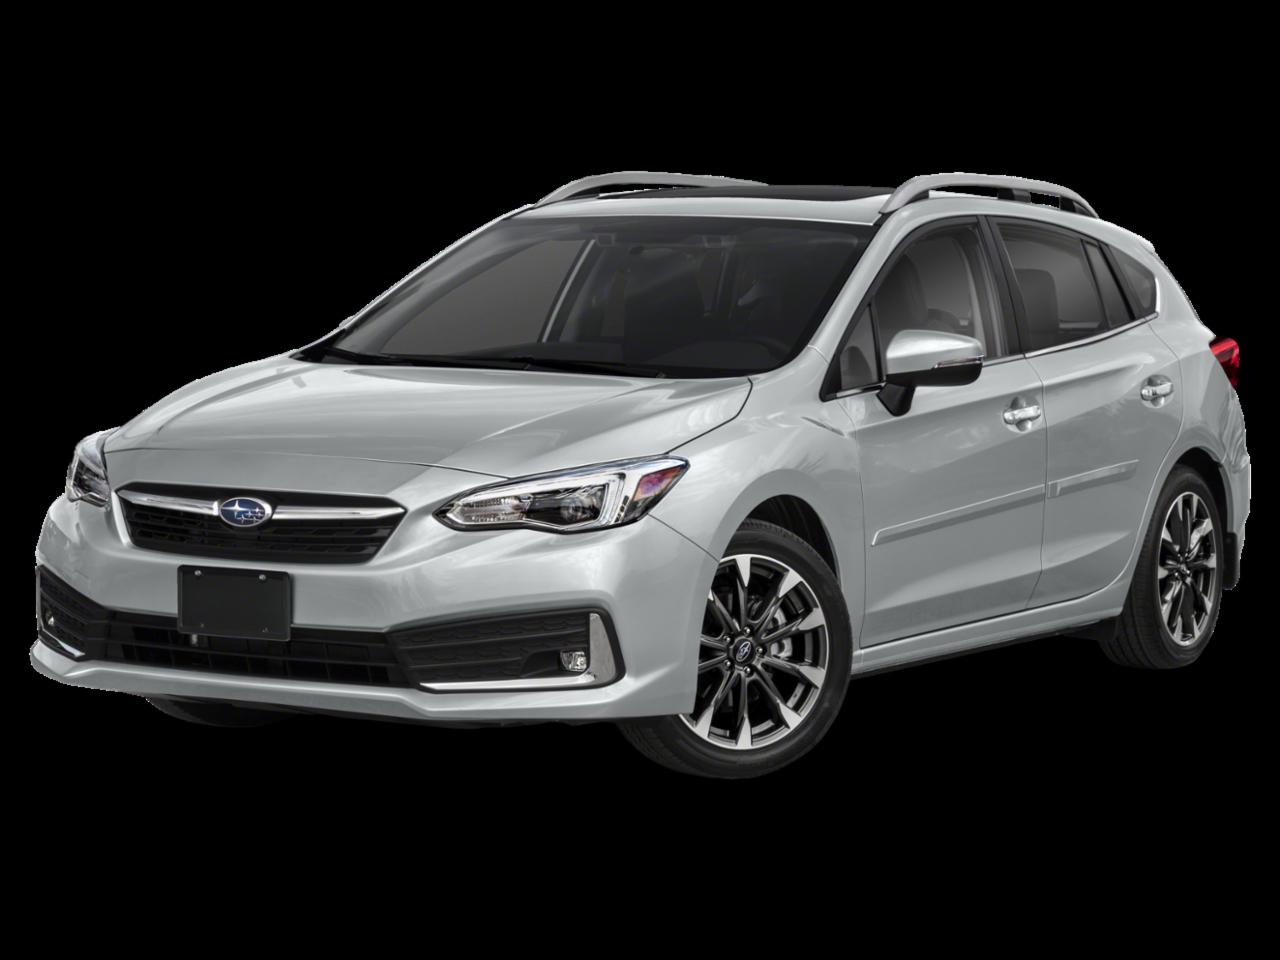 2020 Subaru Impreza 2.0i Premium 4dr Car